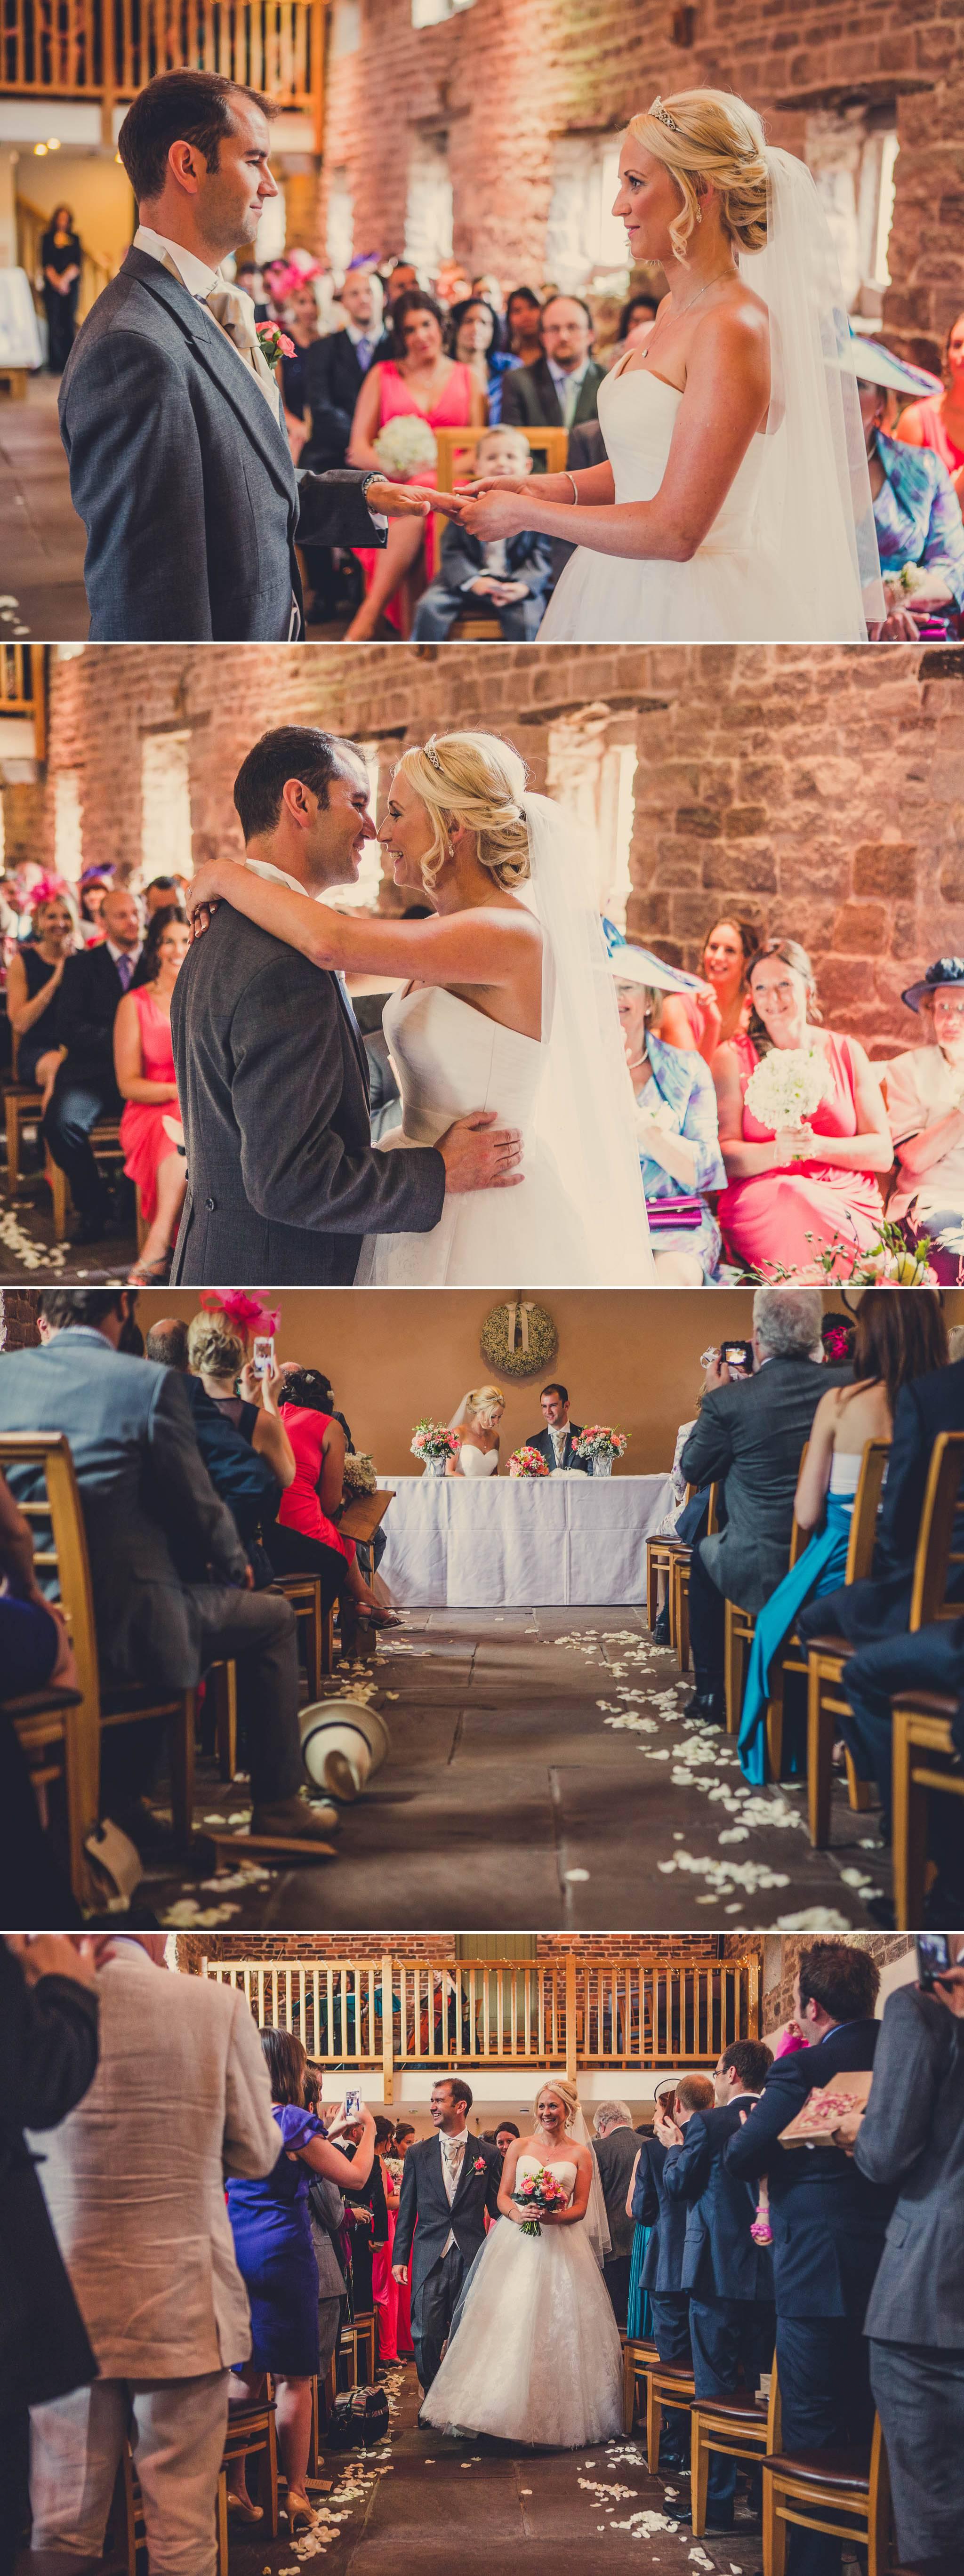 the-ashes-wedding-photographer 9.jpg